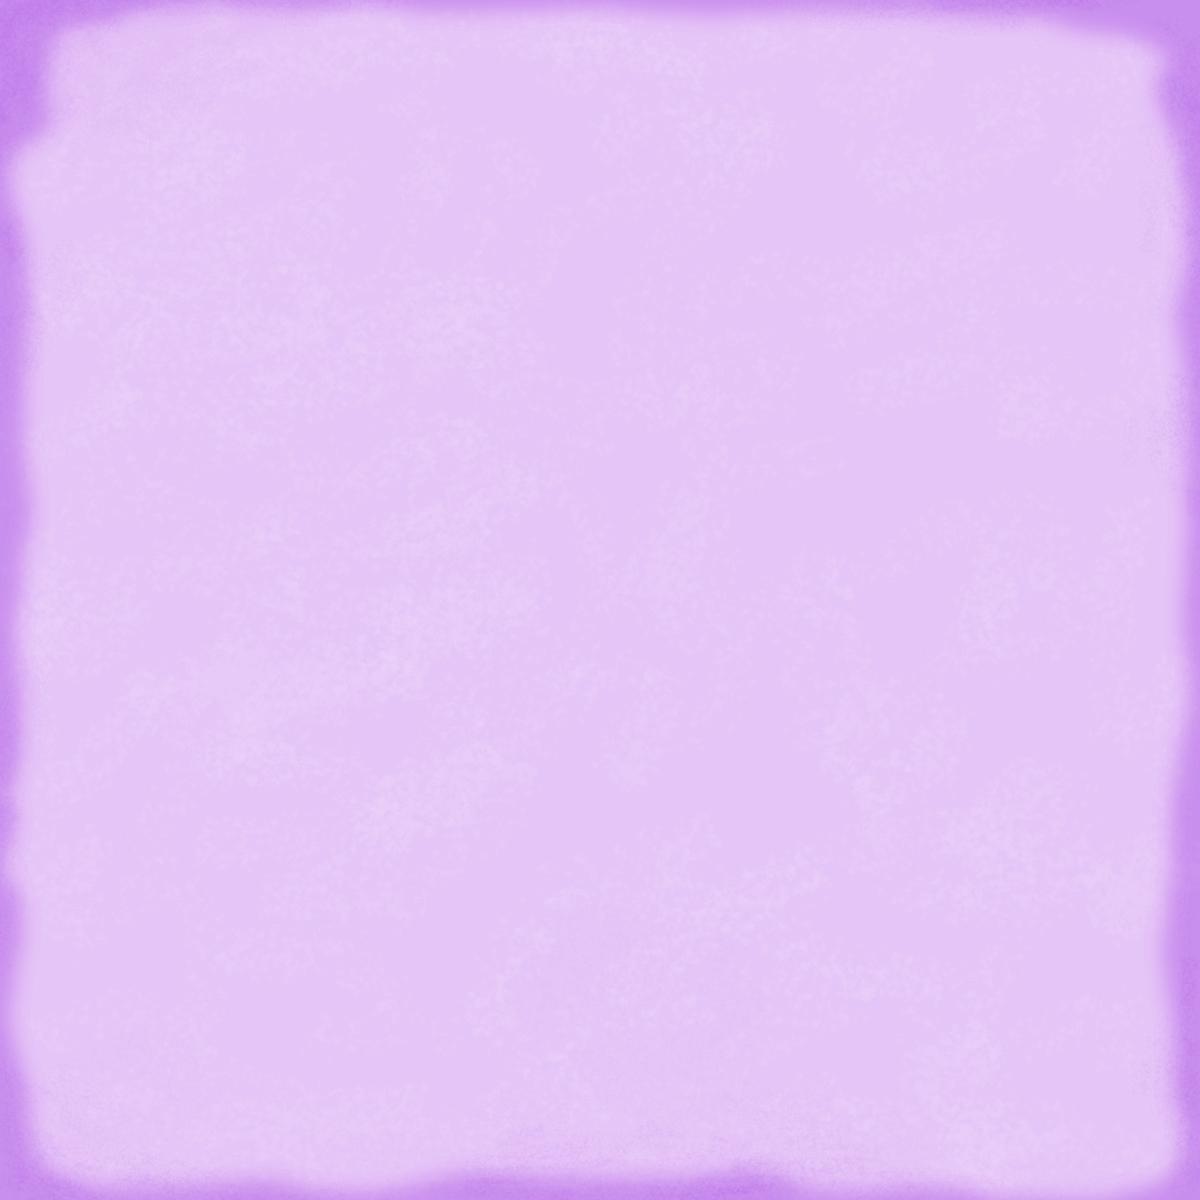 GrannyEnchanted.Com-Paper: Free Aged Sponged Purple Digi ...